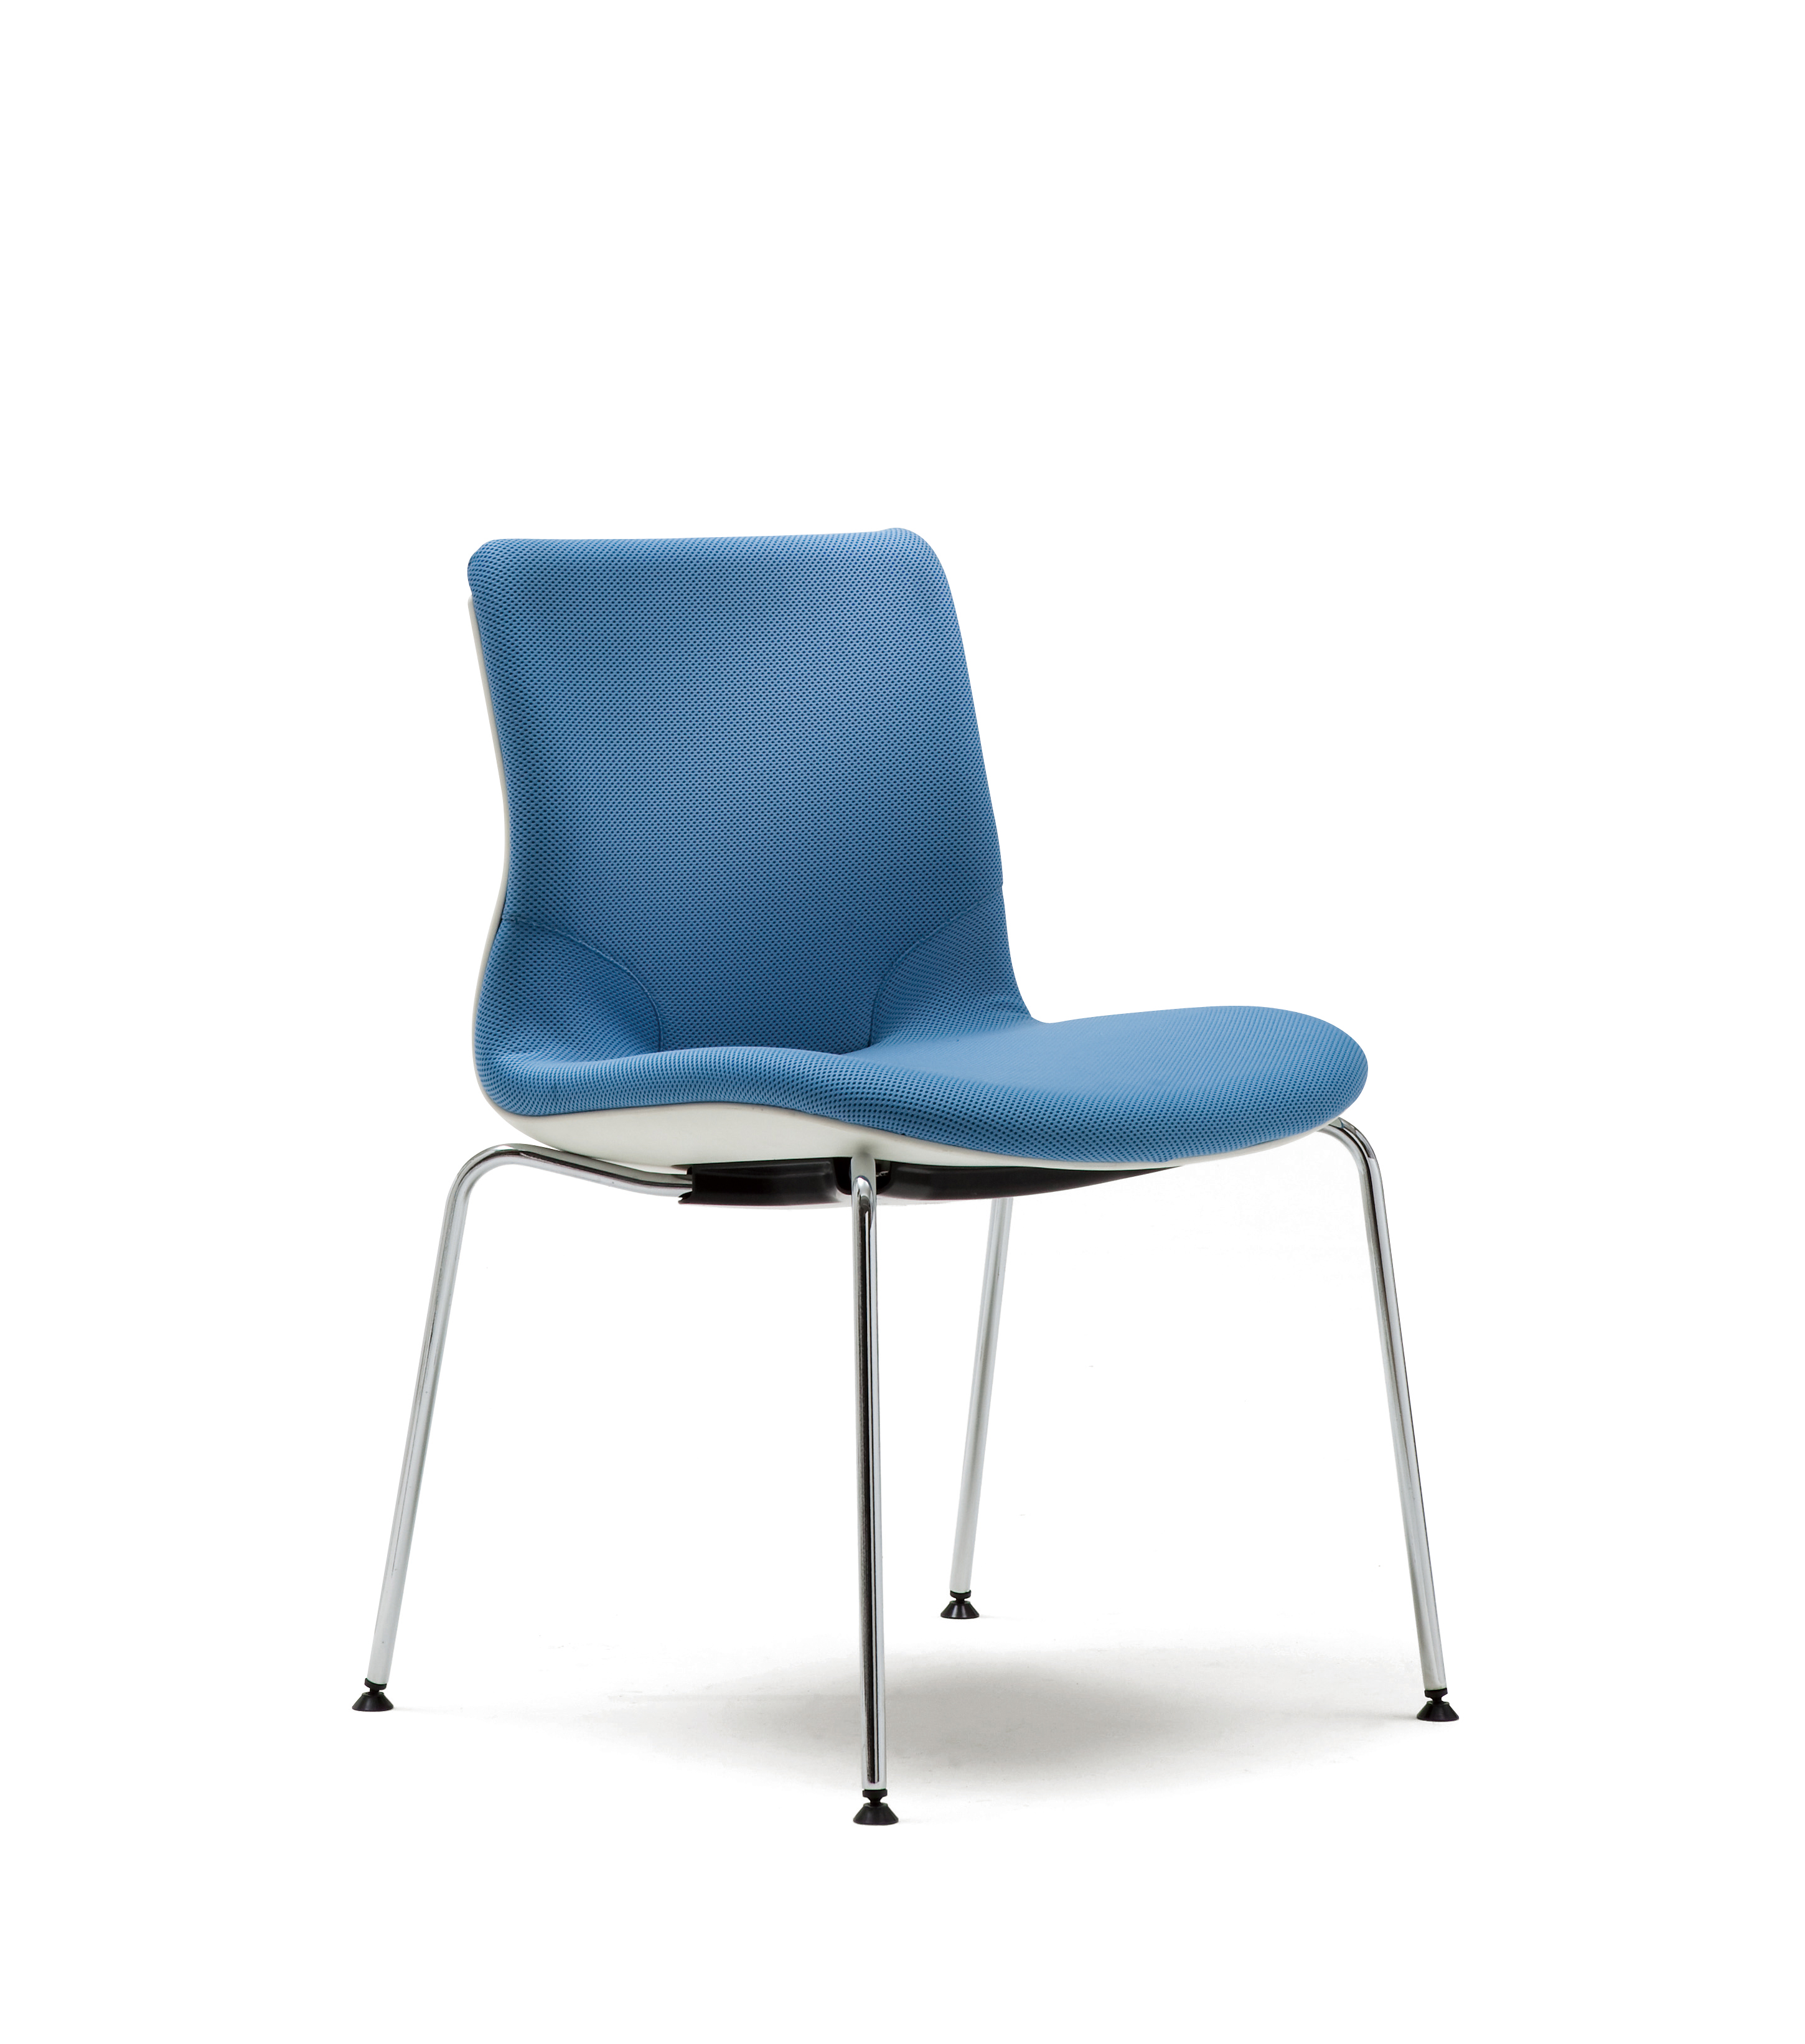 Sidiz EGA Chair 4 Leg